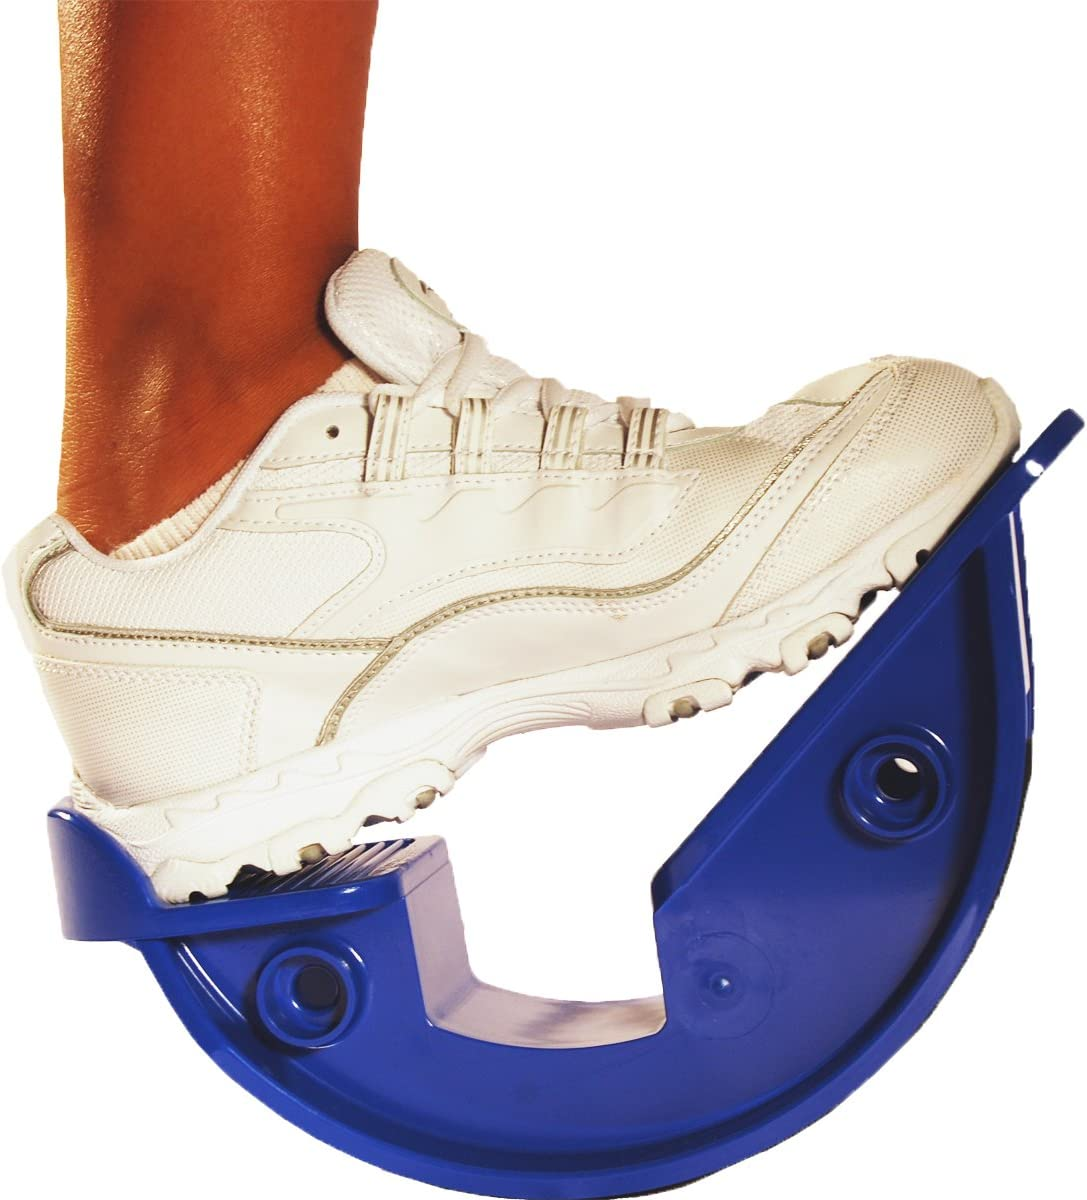 "ProStretch ""Blue"" - The Original Calf Stretcher & Foot Rocker for Plantar Fasciitis, Achilles Tendonitis & Tight Calf Pain (Slip Resistant Bottom)"